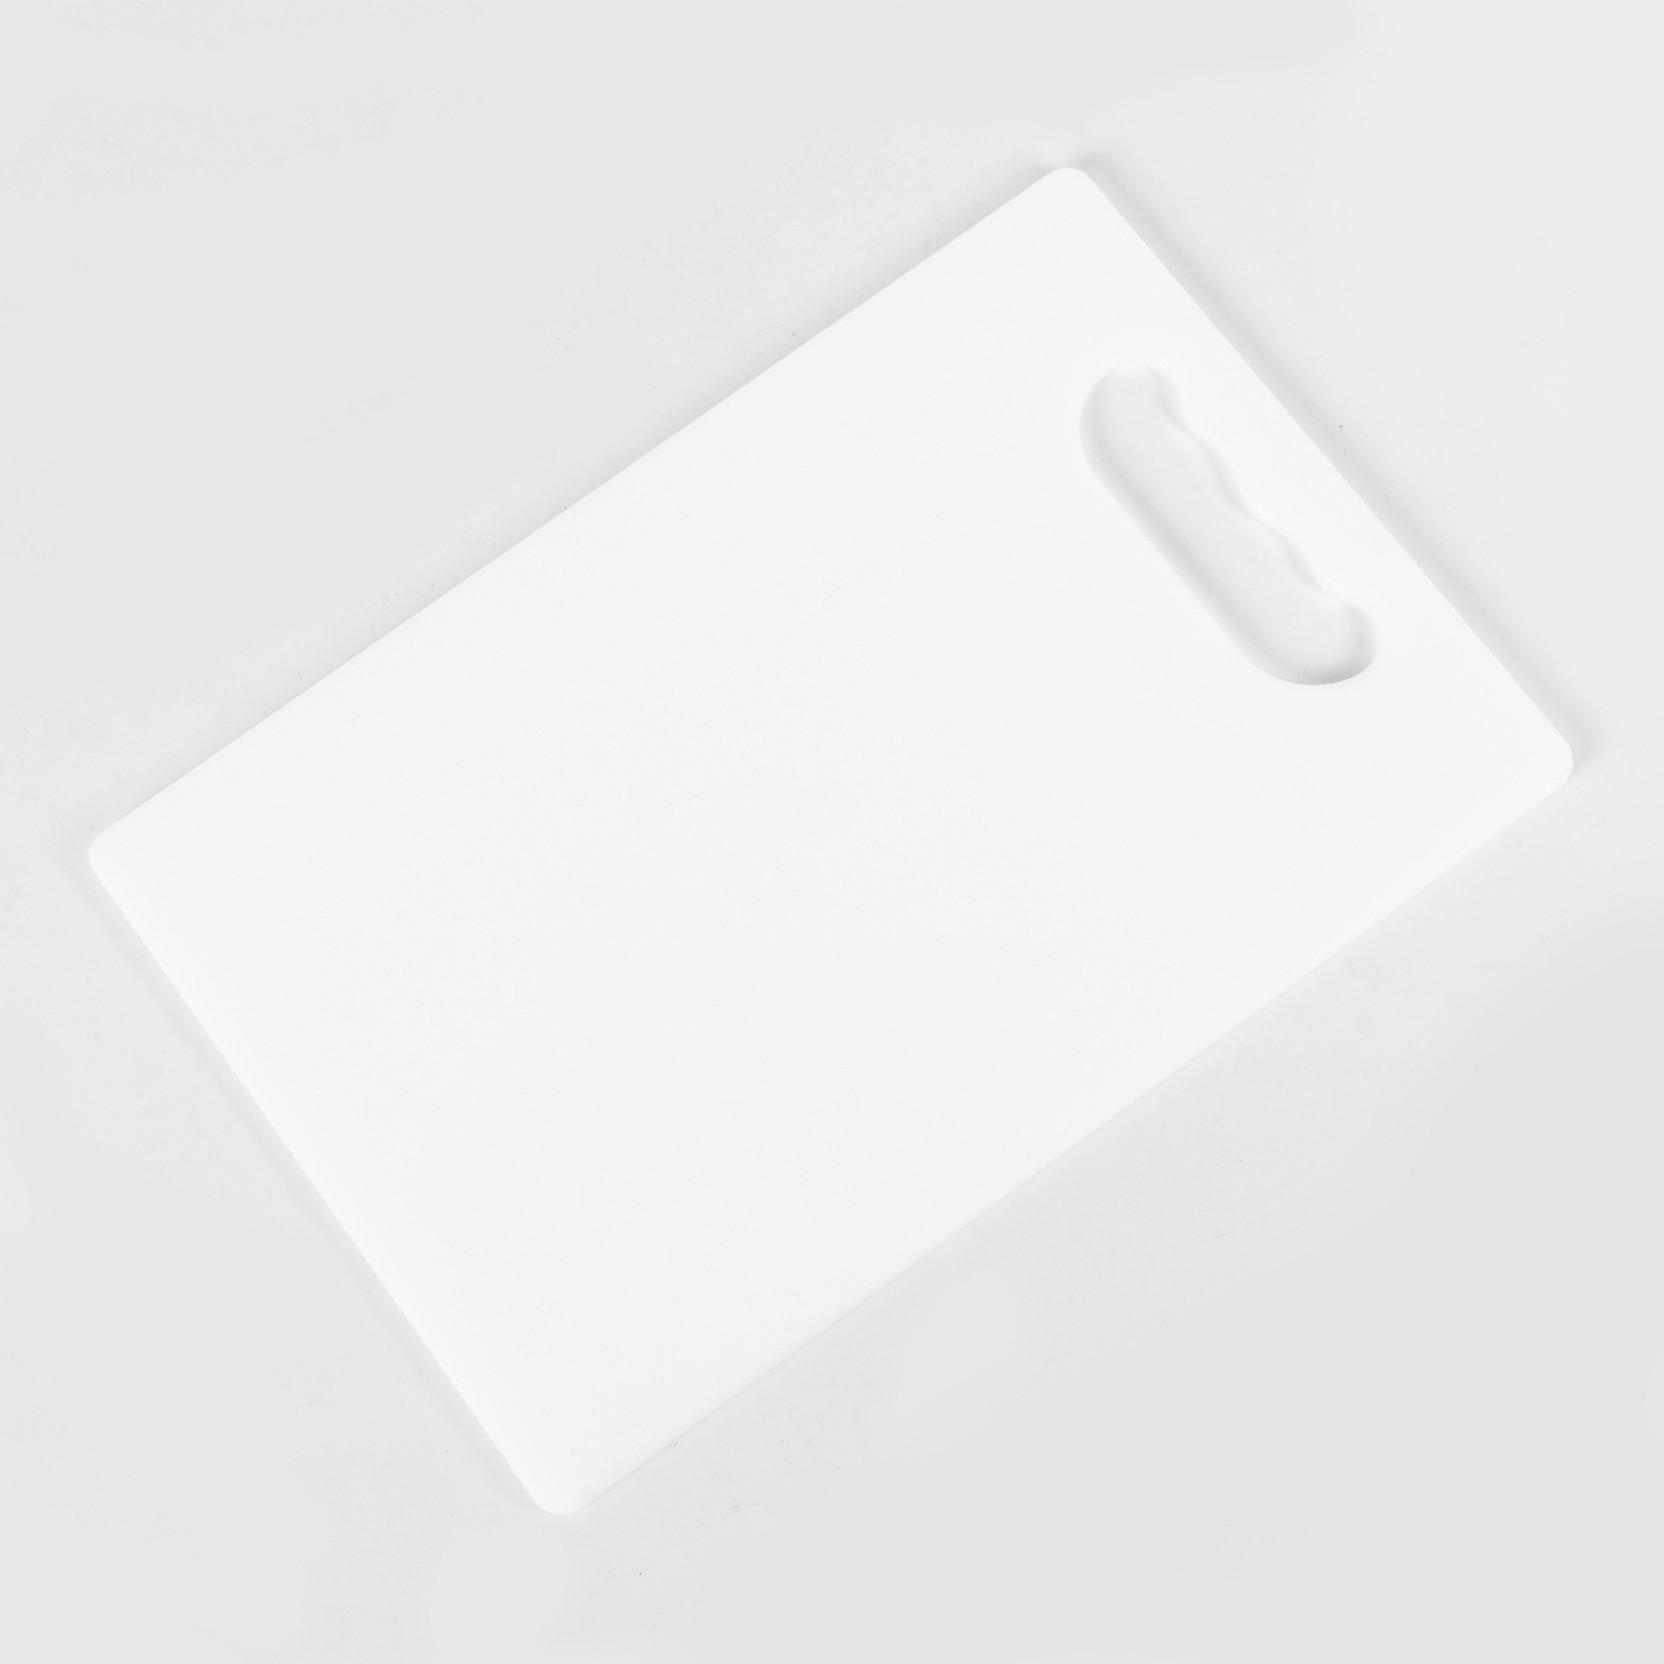 Small Chopping Board Plastic Cutting Add To Cart